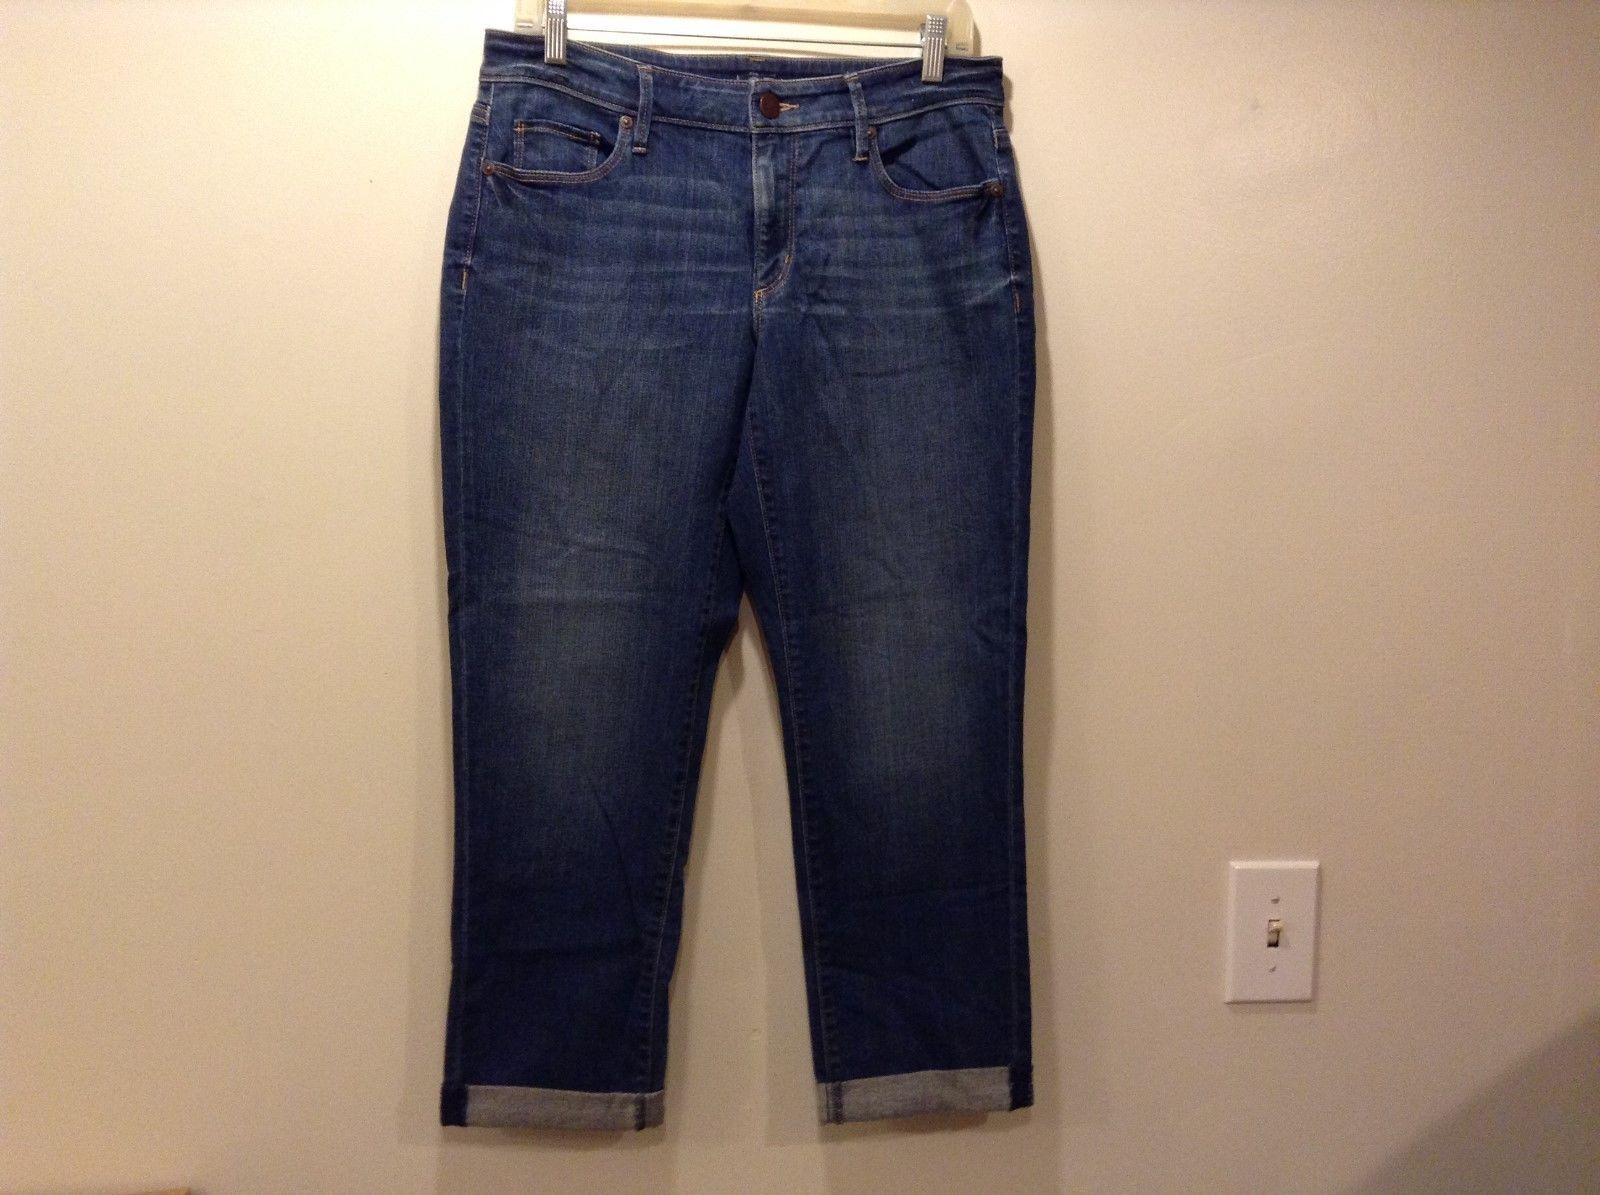 Ann Taylor LOFT Med Blue Cuffed Cropped Jeans Sz 29/8